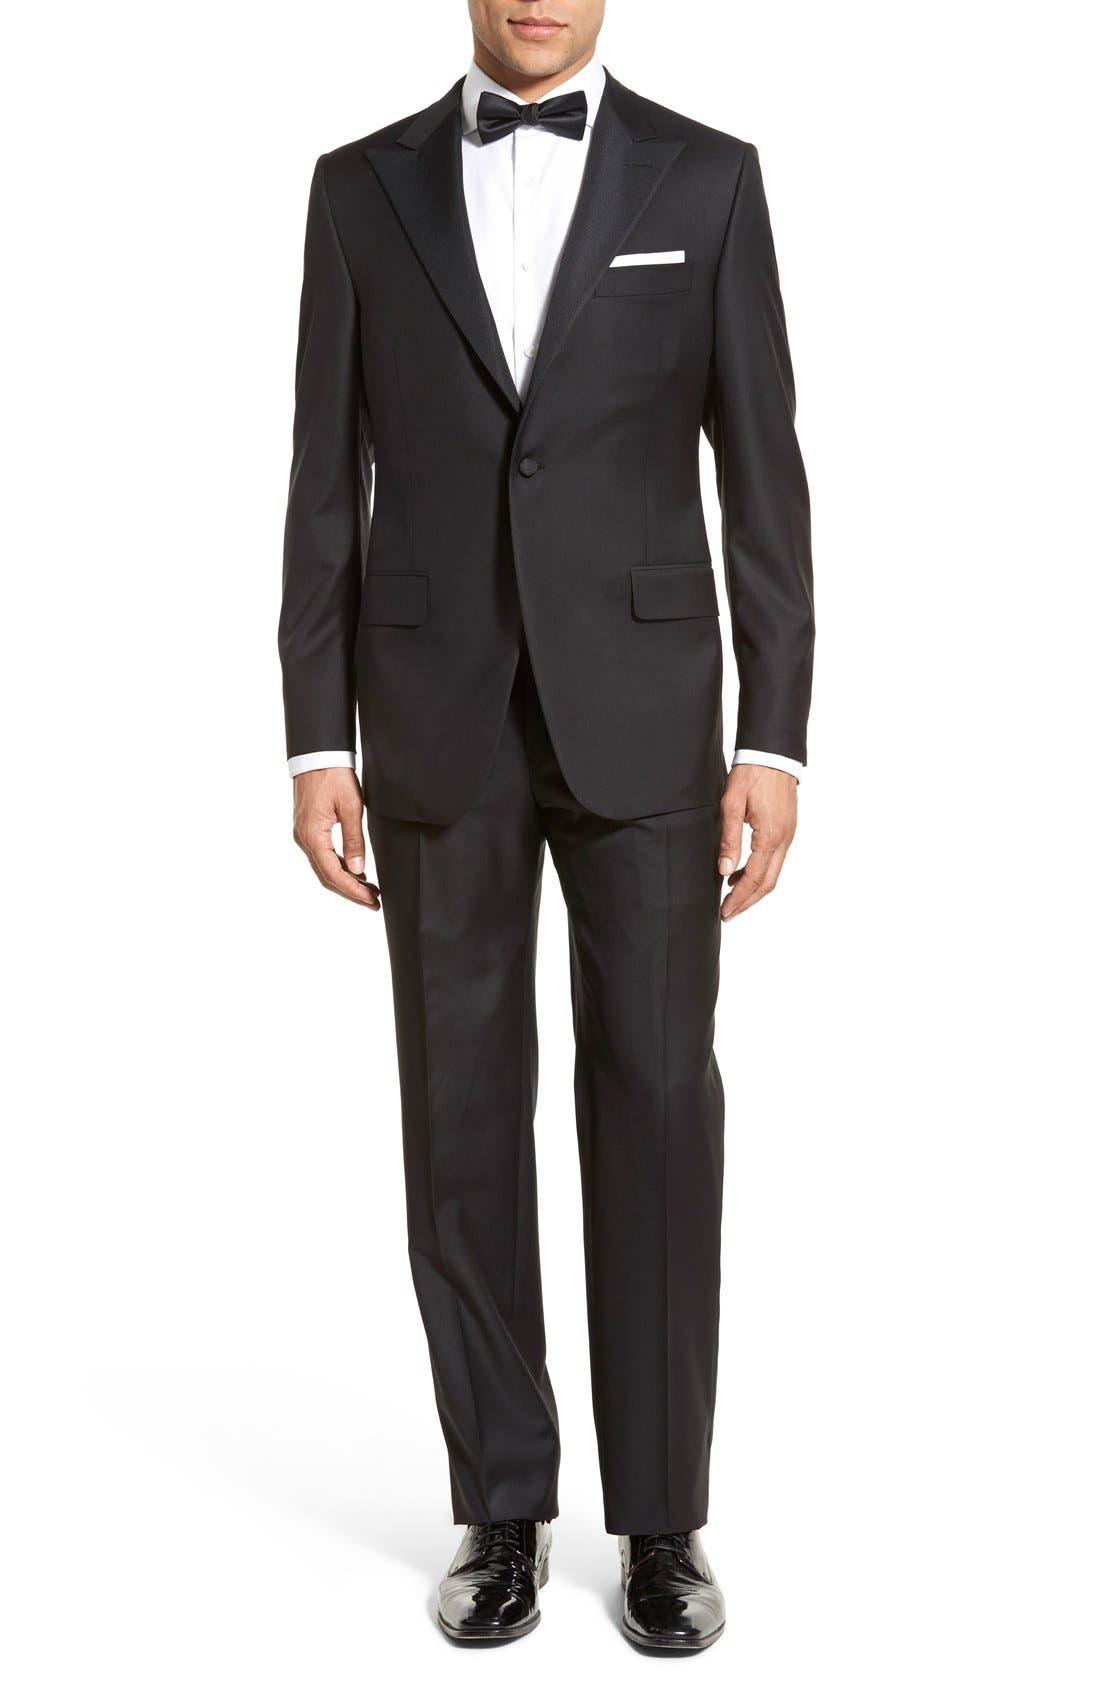 Alternate Image 1 Selected - Hickey Freeman Classic B Fit Tasmanian Wool Tuxedo